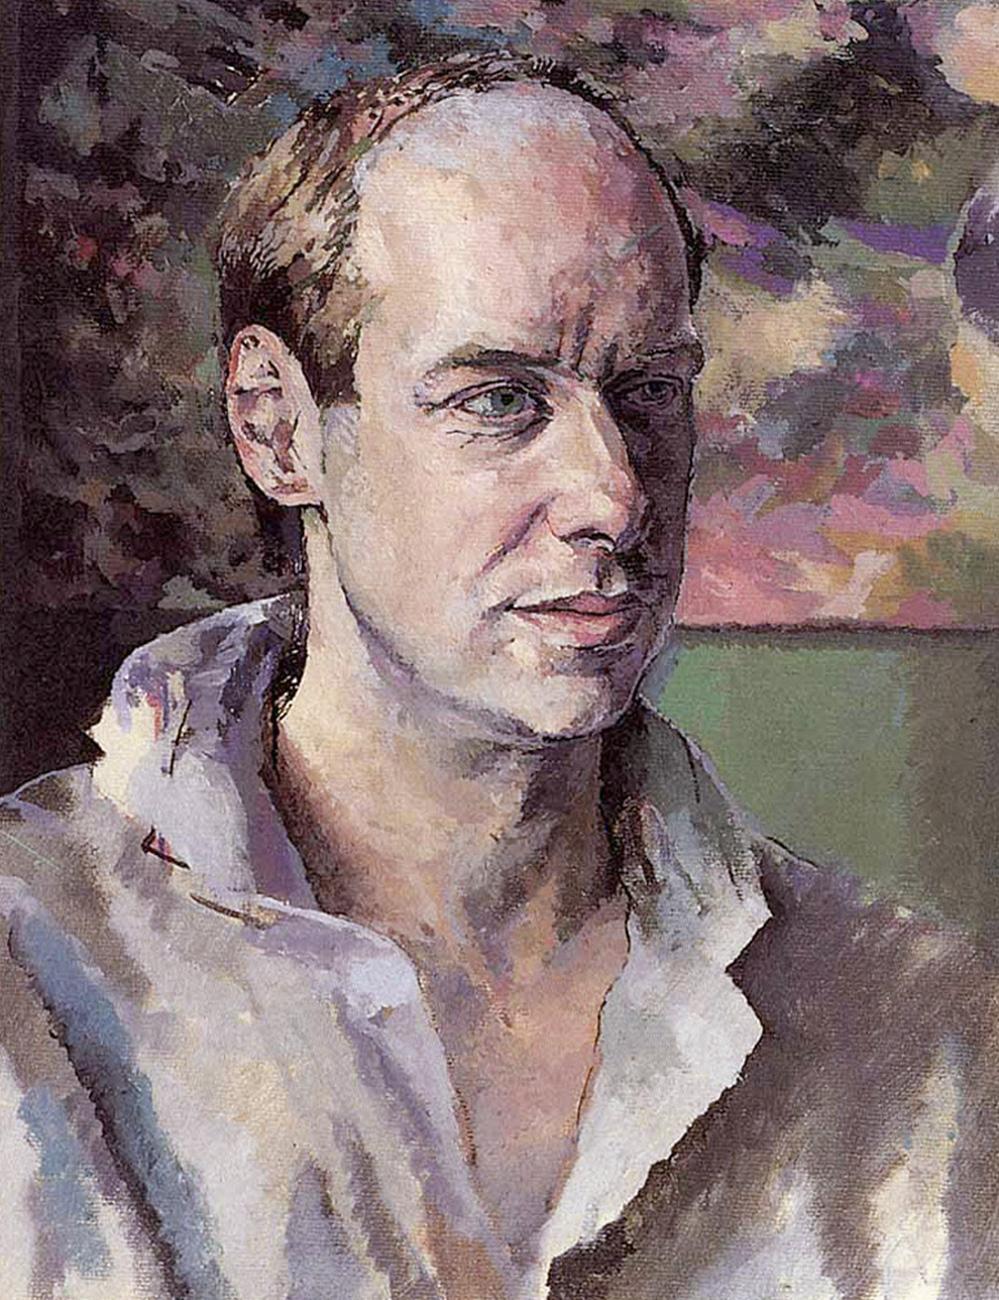 Camasa casual moderna in viziunea lui Brian Eno -National Portrait Gallery - By Tom Philips